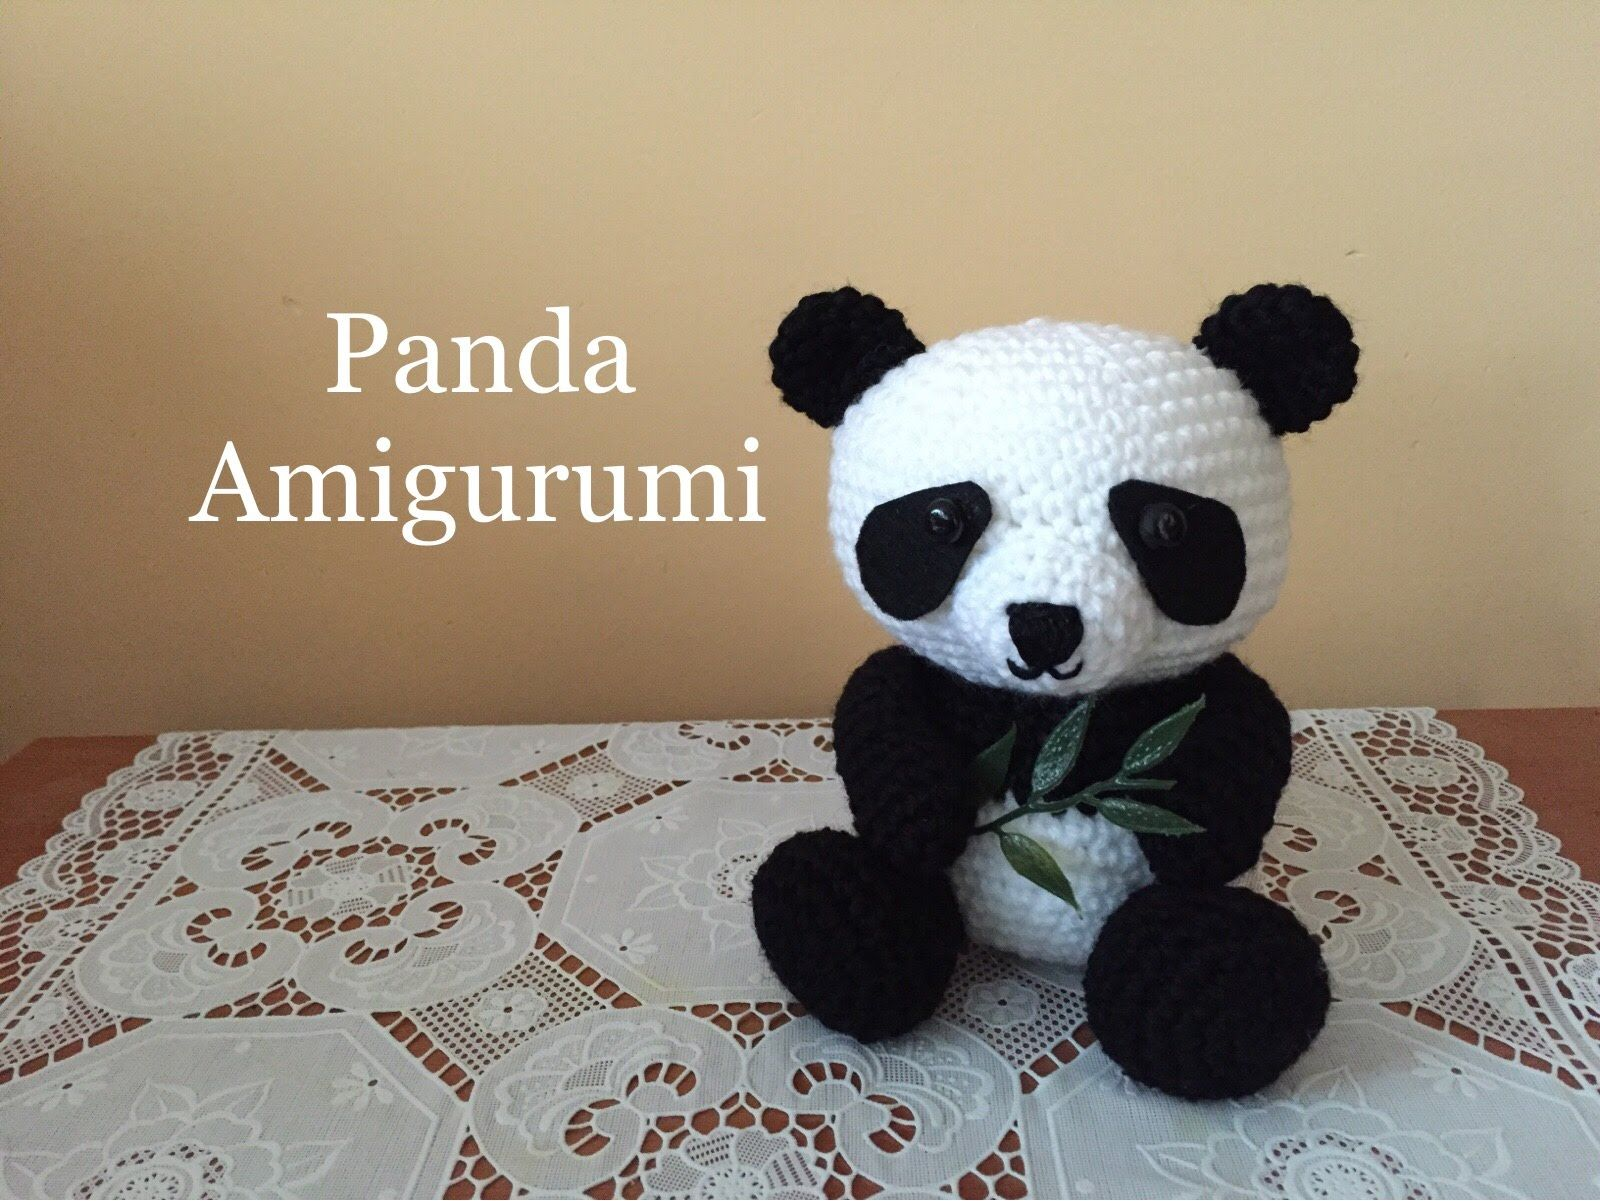 Panda Amigurumi (tutorial) | amigurimi | Pinterest | Häkeltiere ...